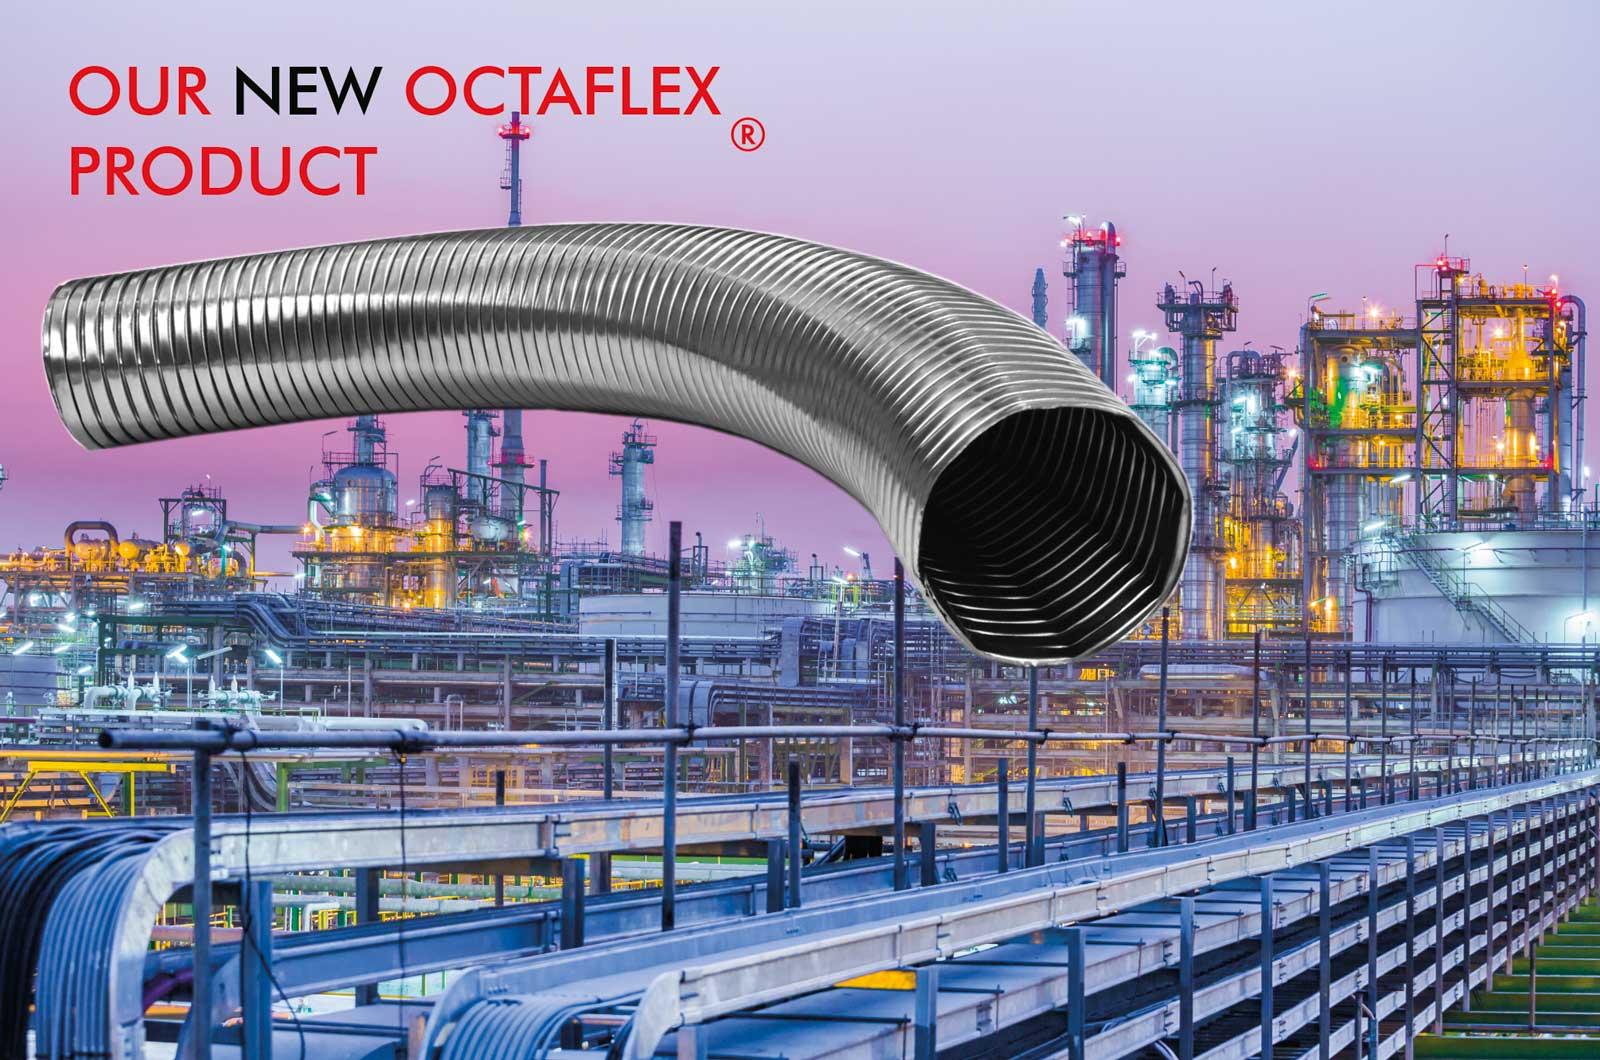 Our new Octaflex design tube